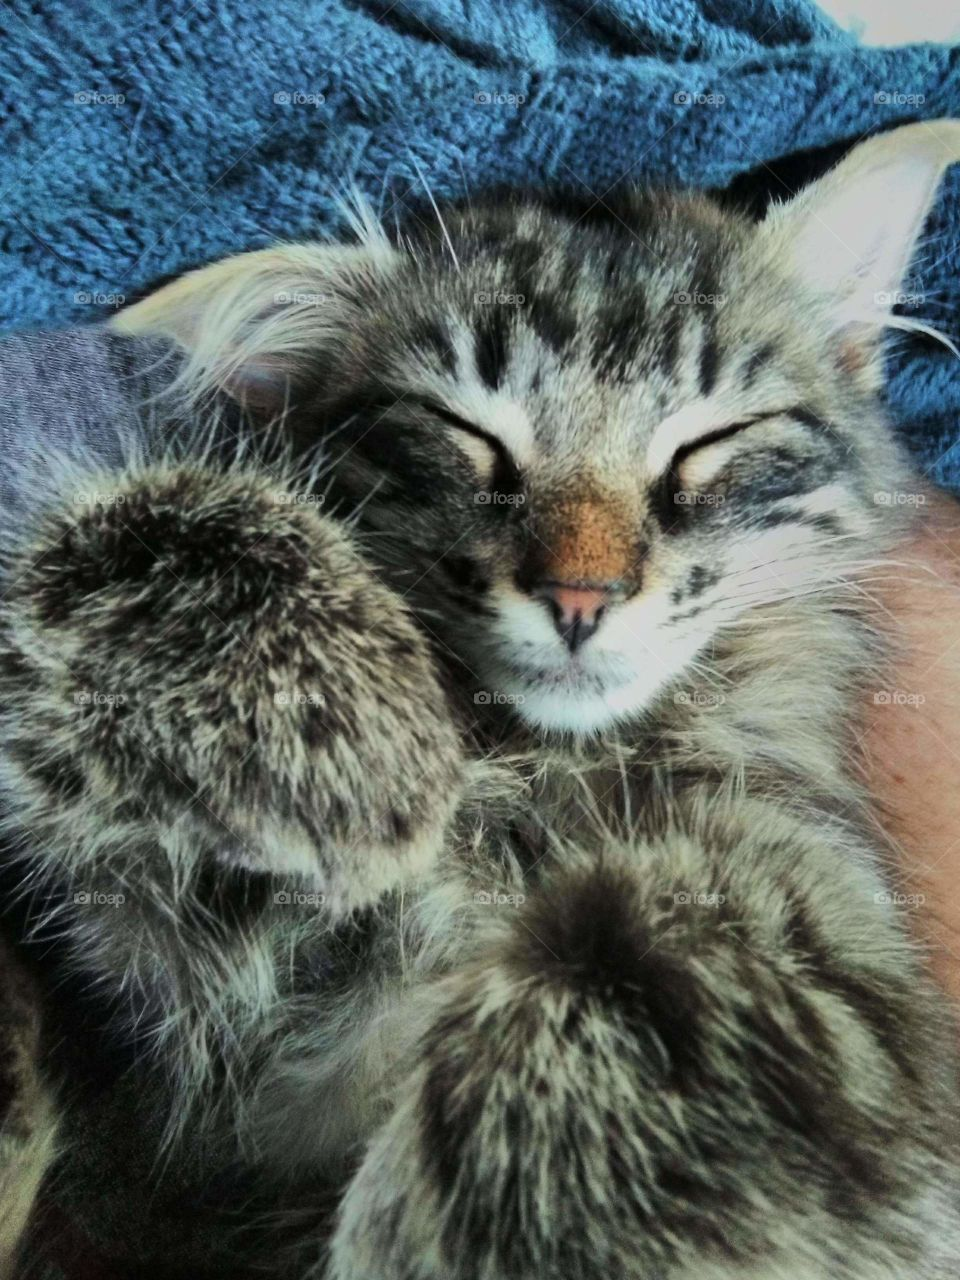 kitty lovin